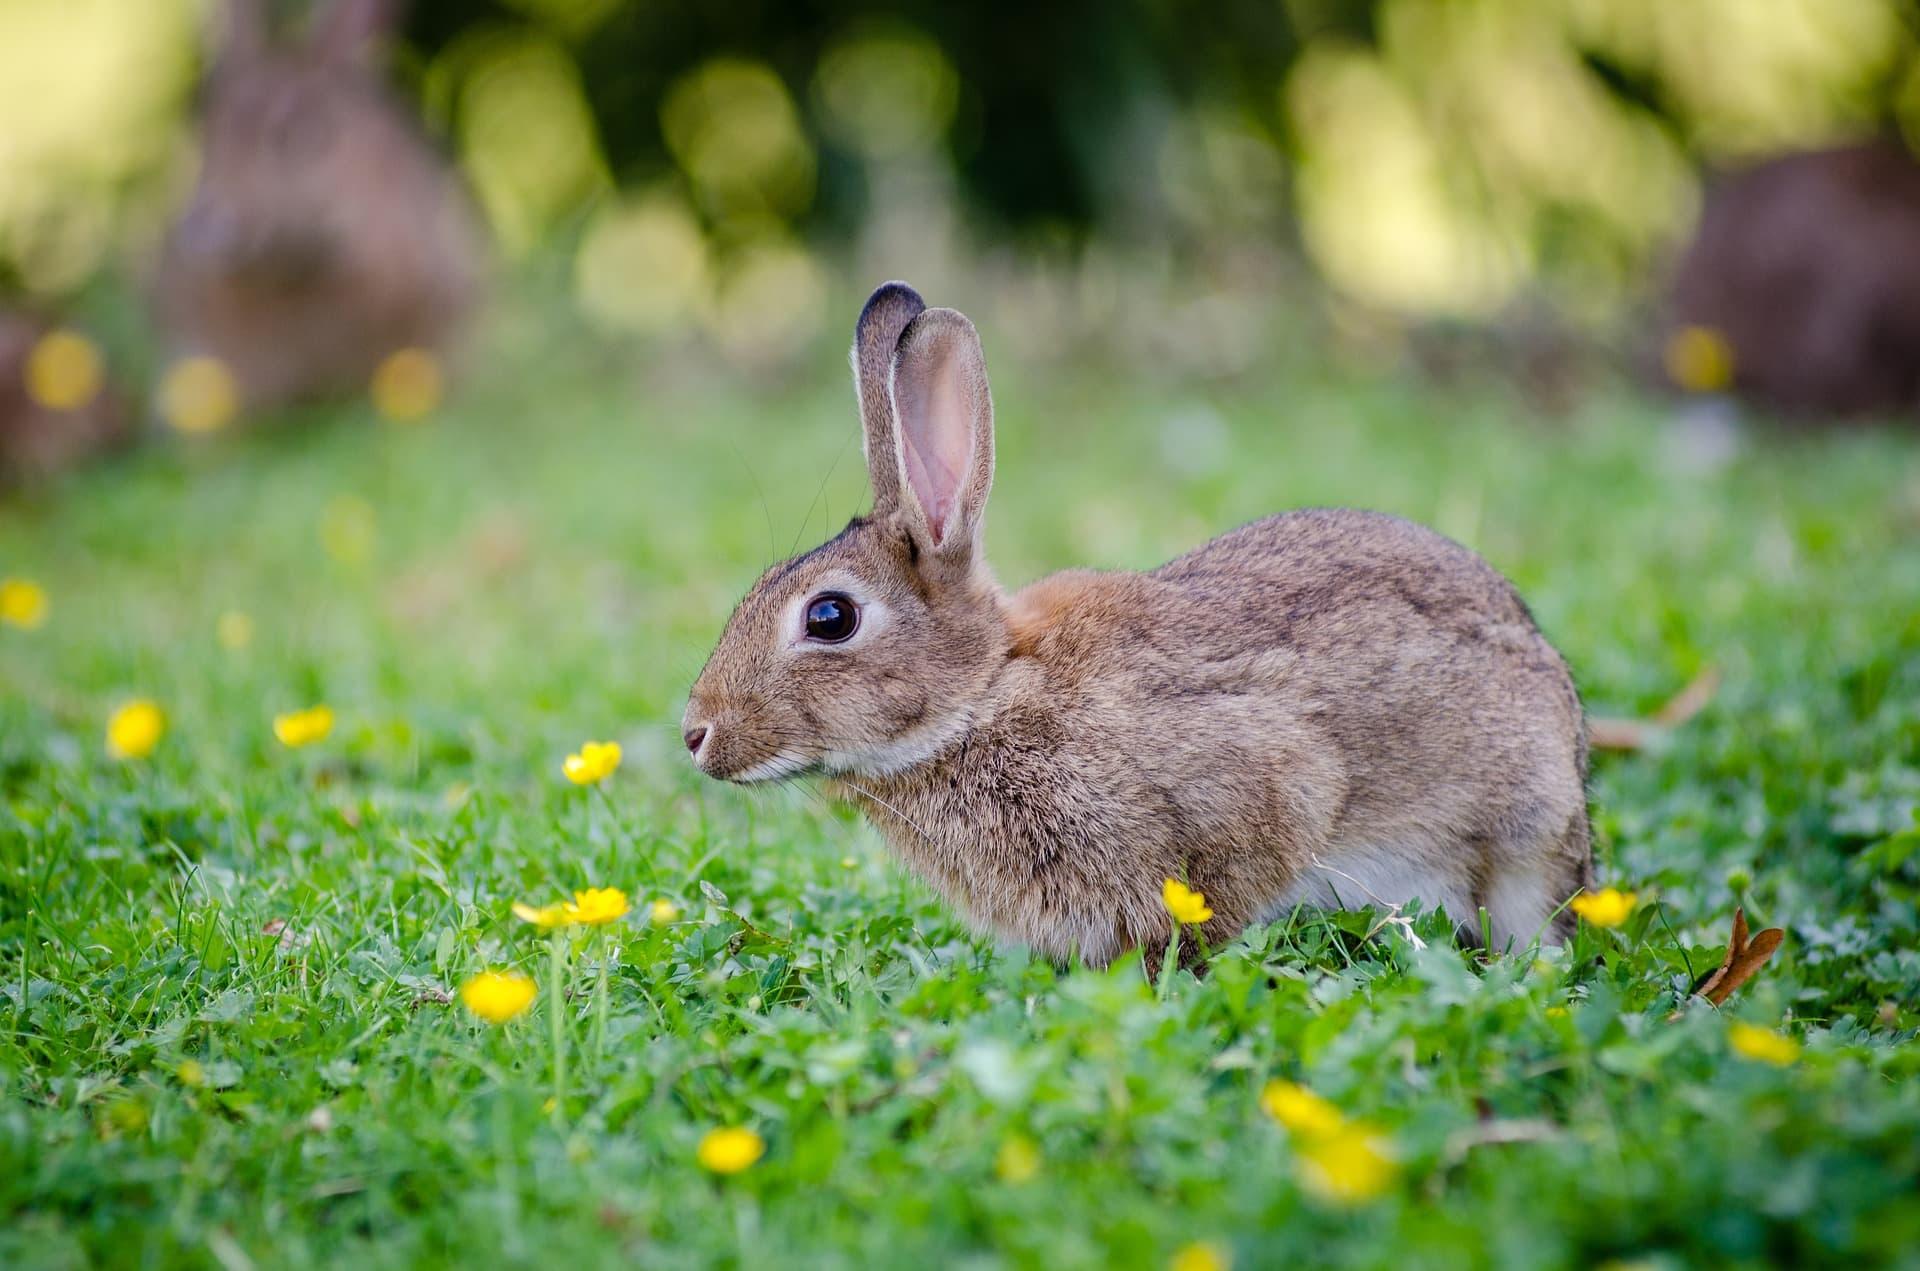 Poisonous Plants And Your Rabbit